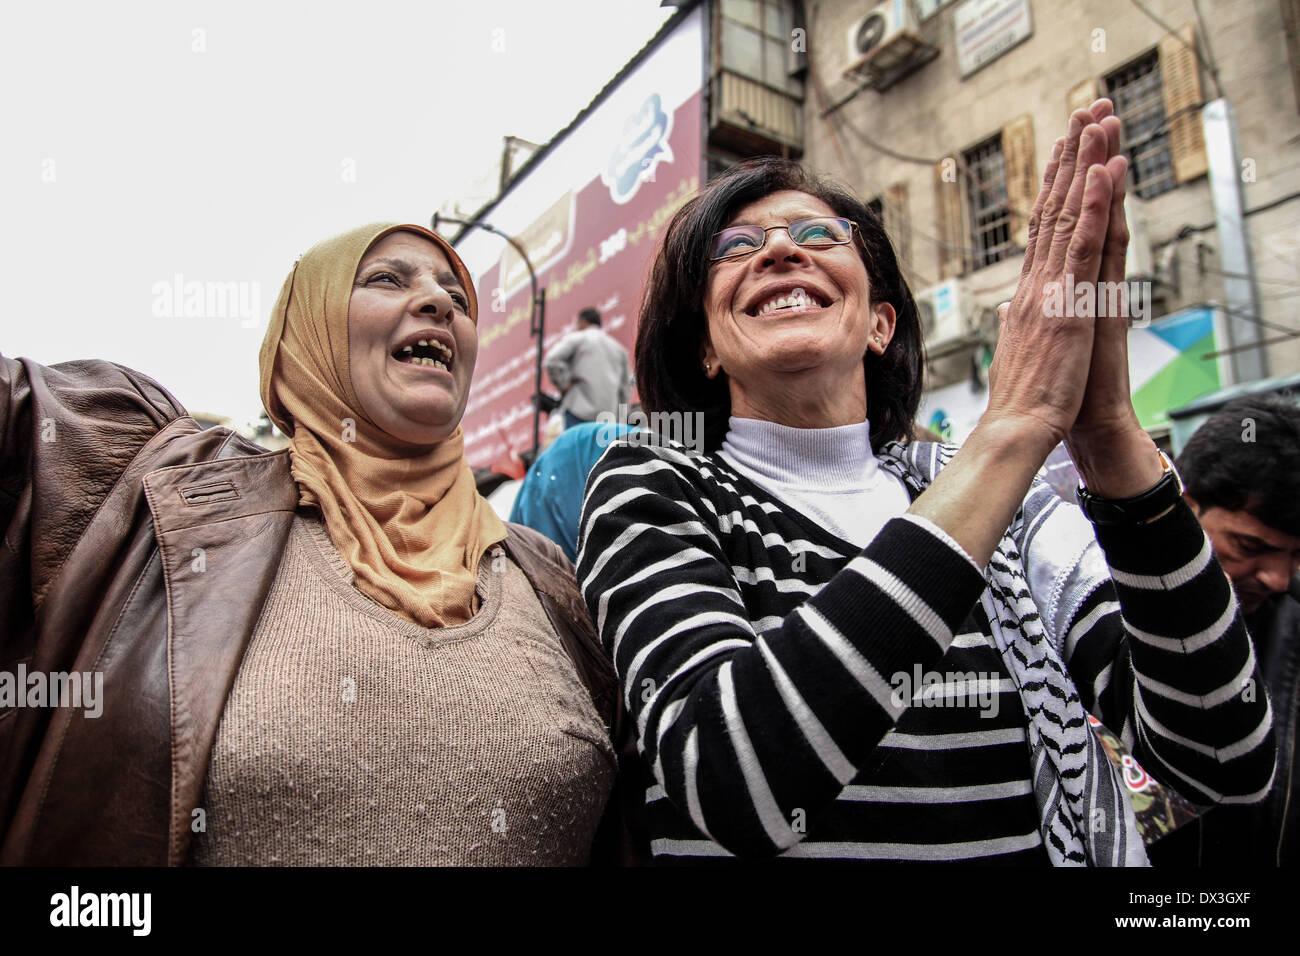 Ramallah, Palestinian Territories. 17th Mar, 2014. March 17, 2014 - Ramallah, West Bank, Palestinian Territory  Stock Photo